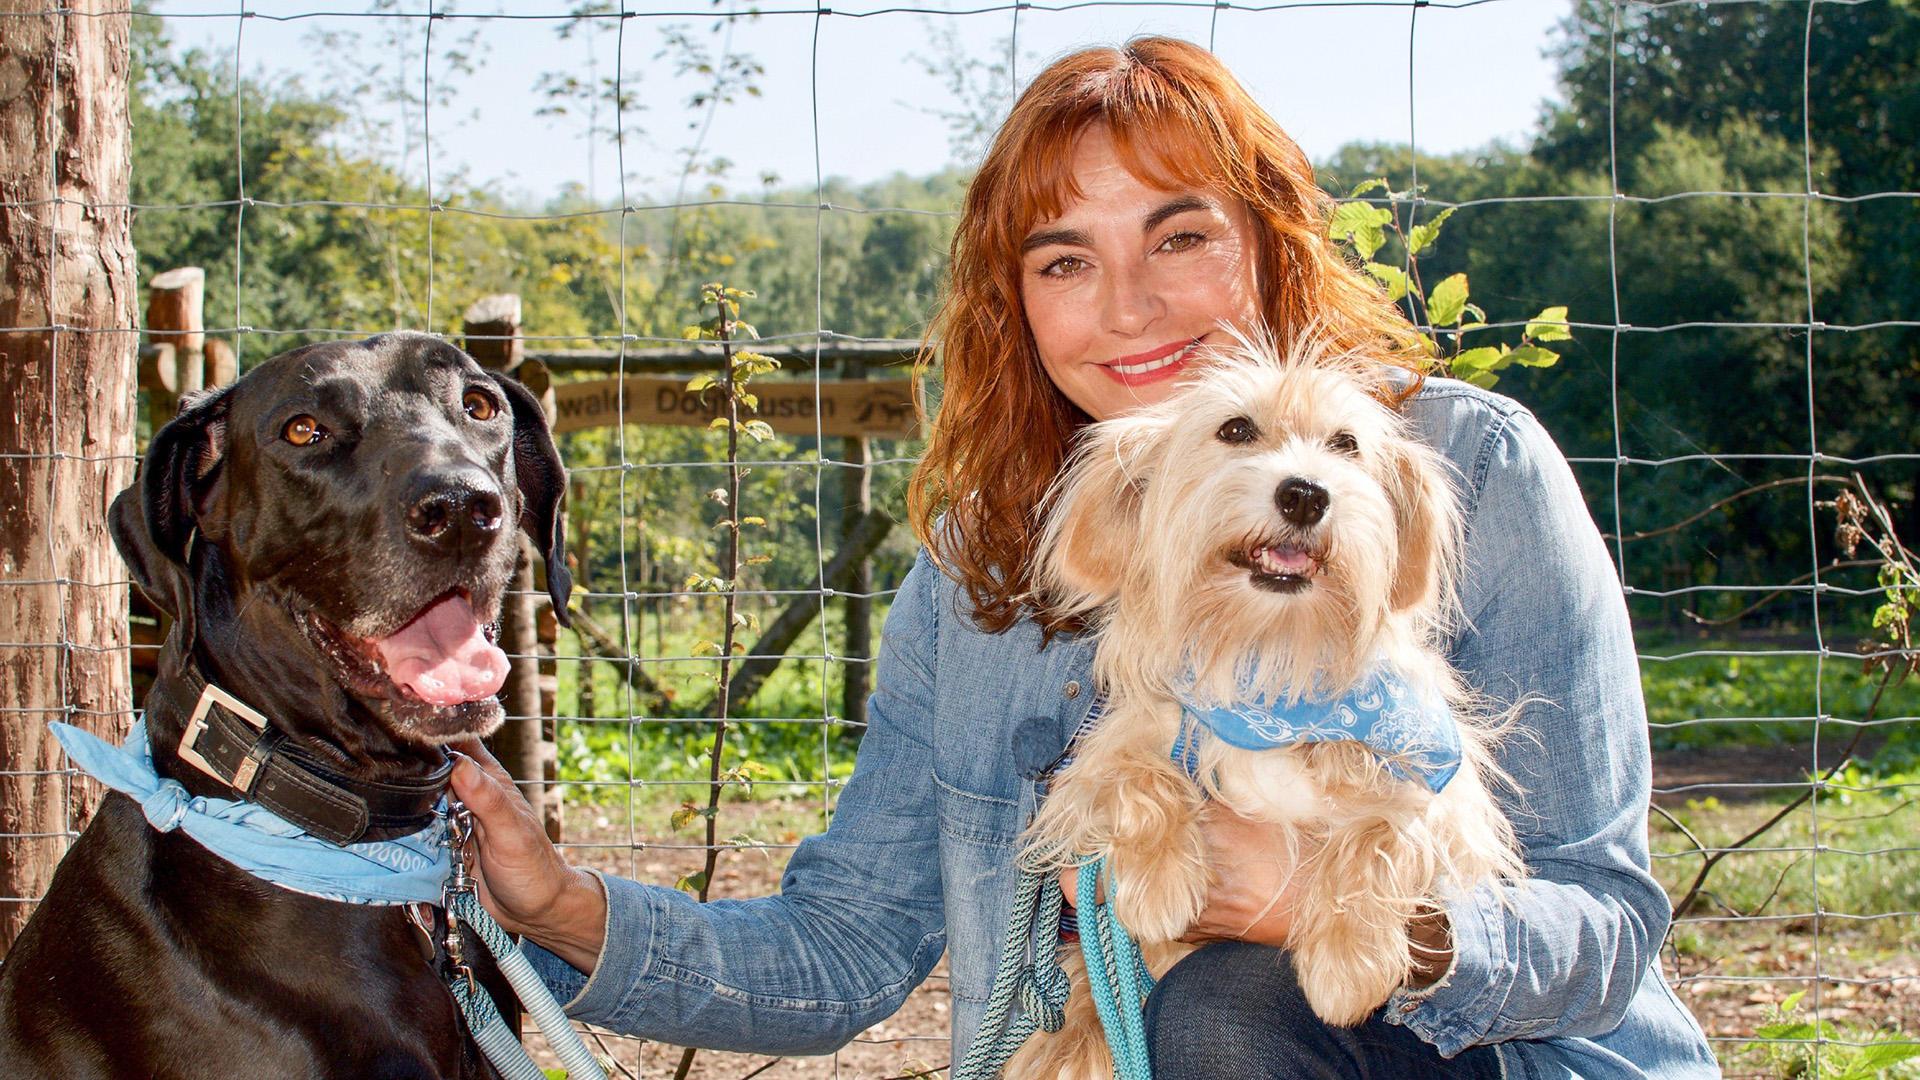 Thema heute u.a.: Der Hundewald Lünen | Folge 46